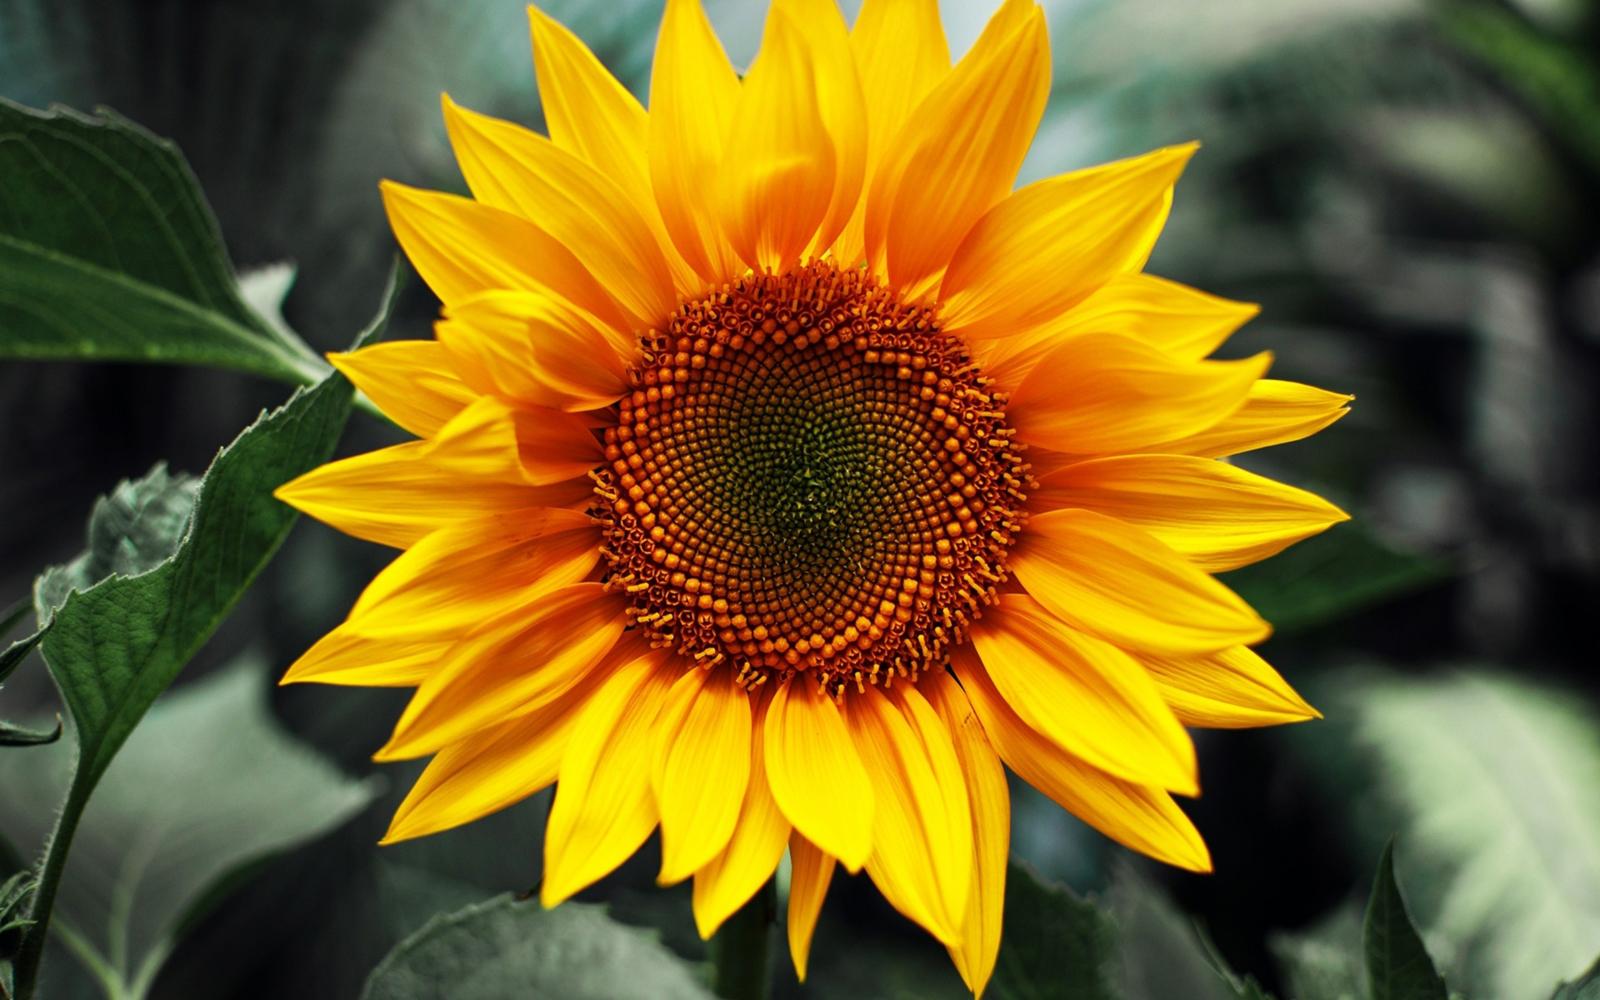 Hd Sunflower Wallpaper Long Hd Wallpapers For Pc ...